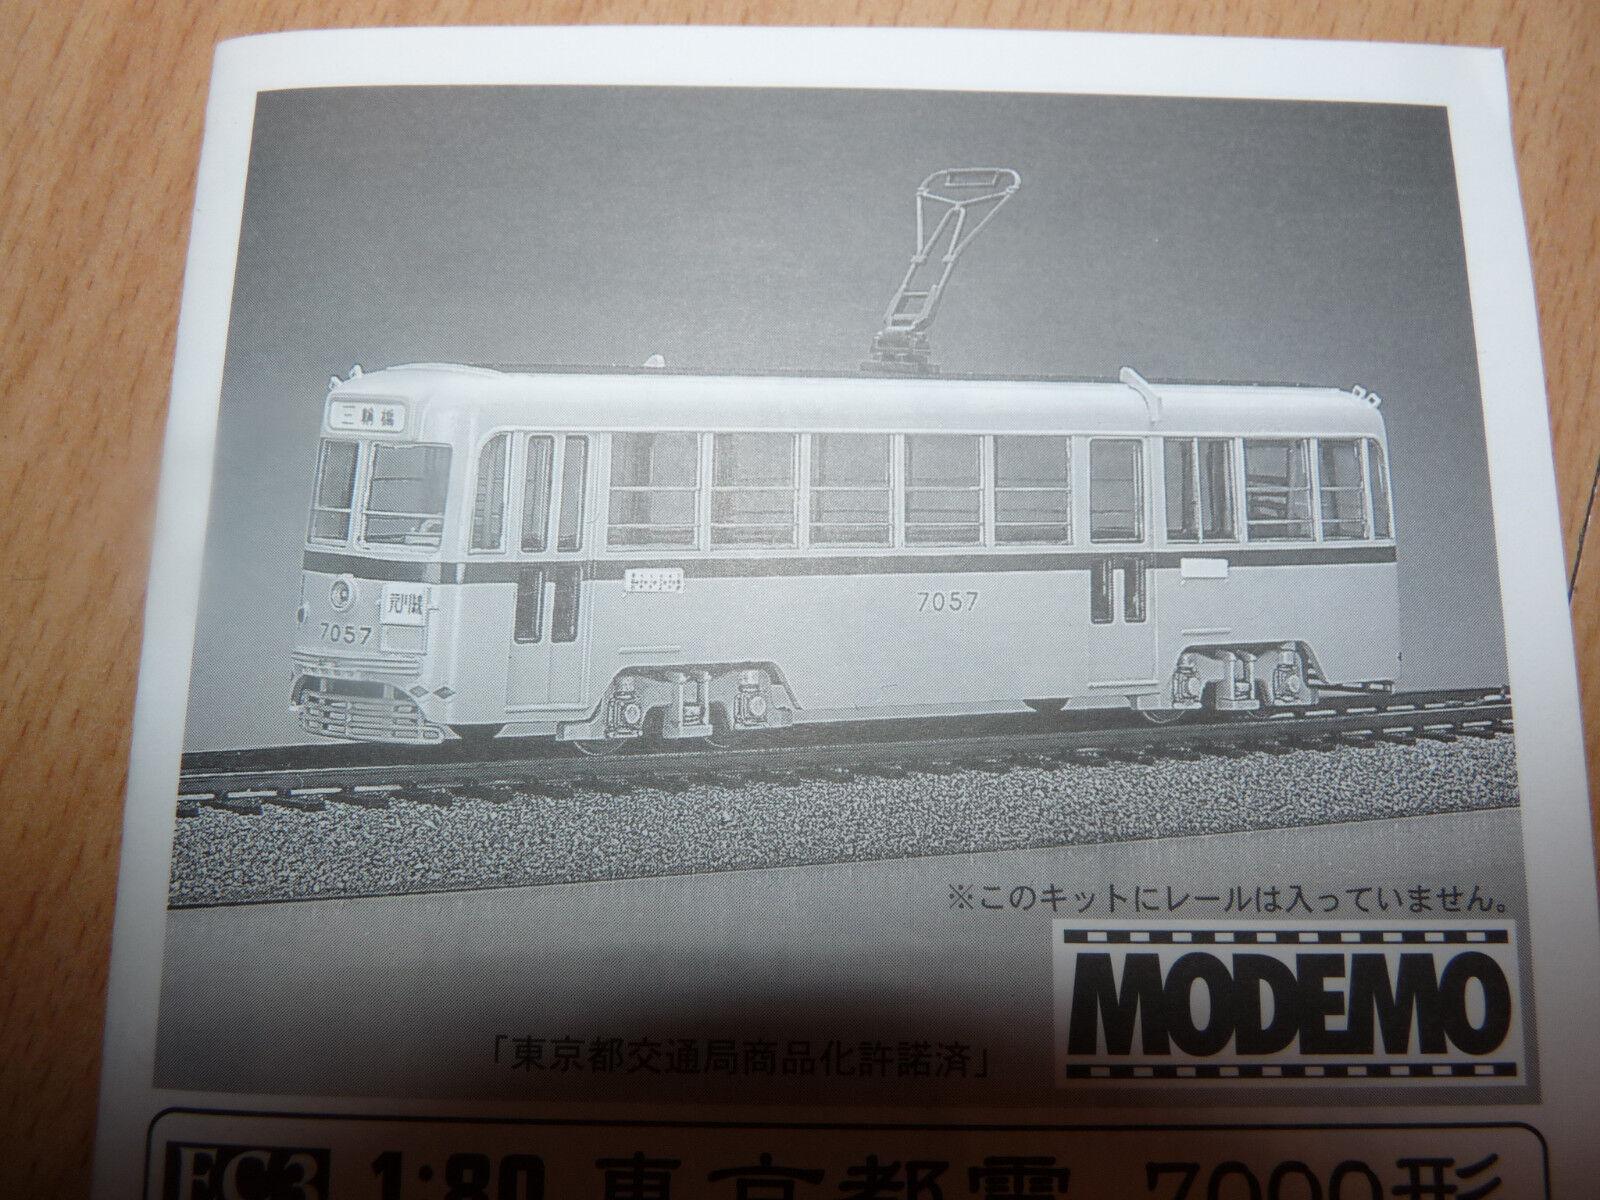 MODEMO Giappone modello Tram Tram Tokyo h0 tram h0/1:80